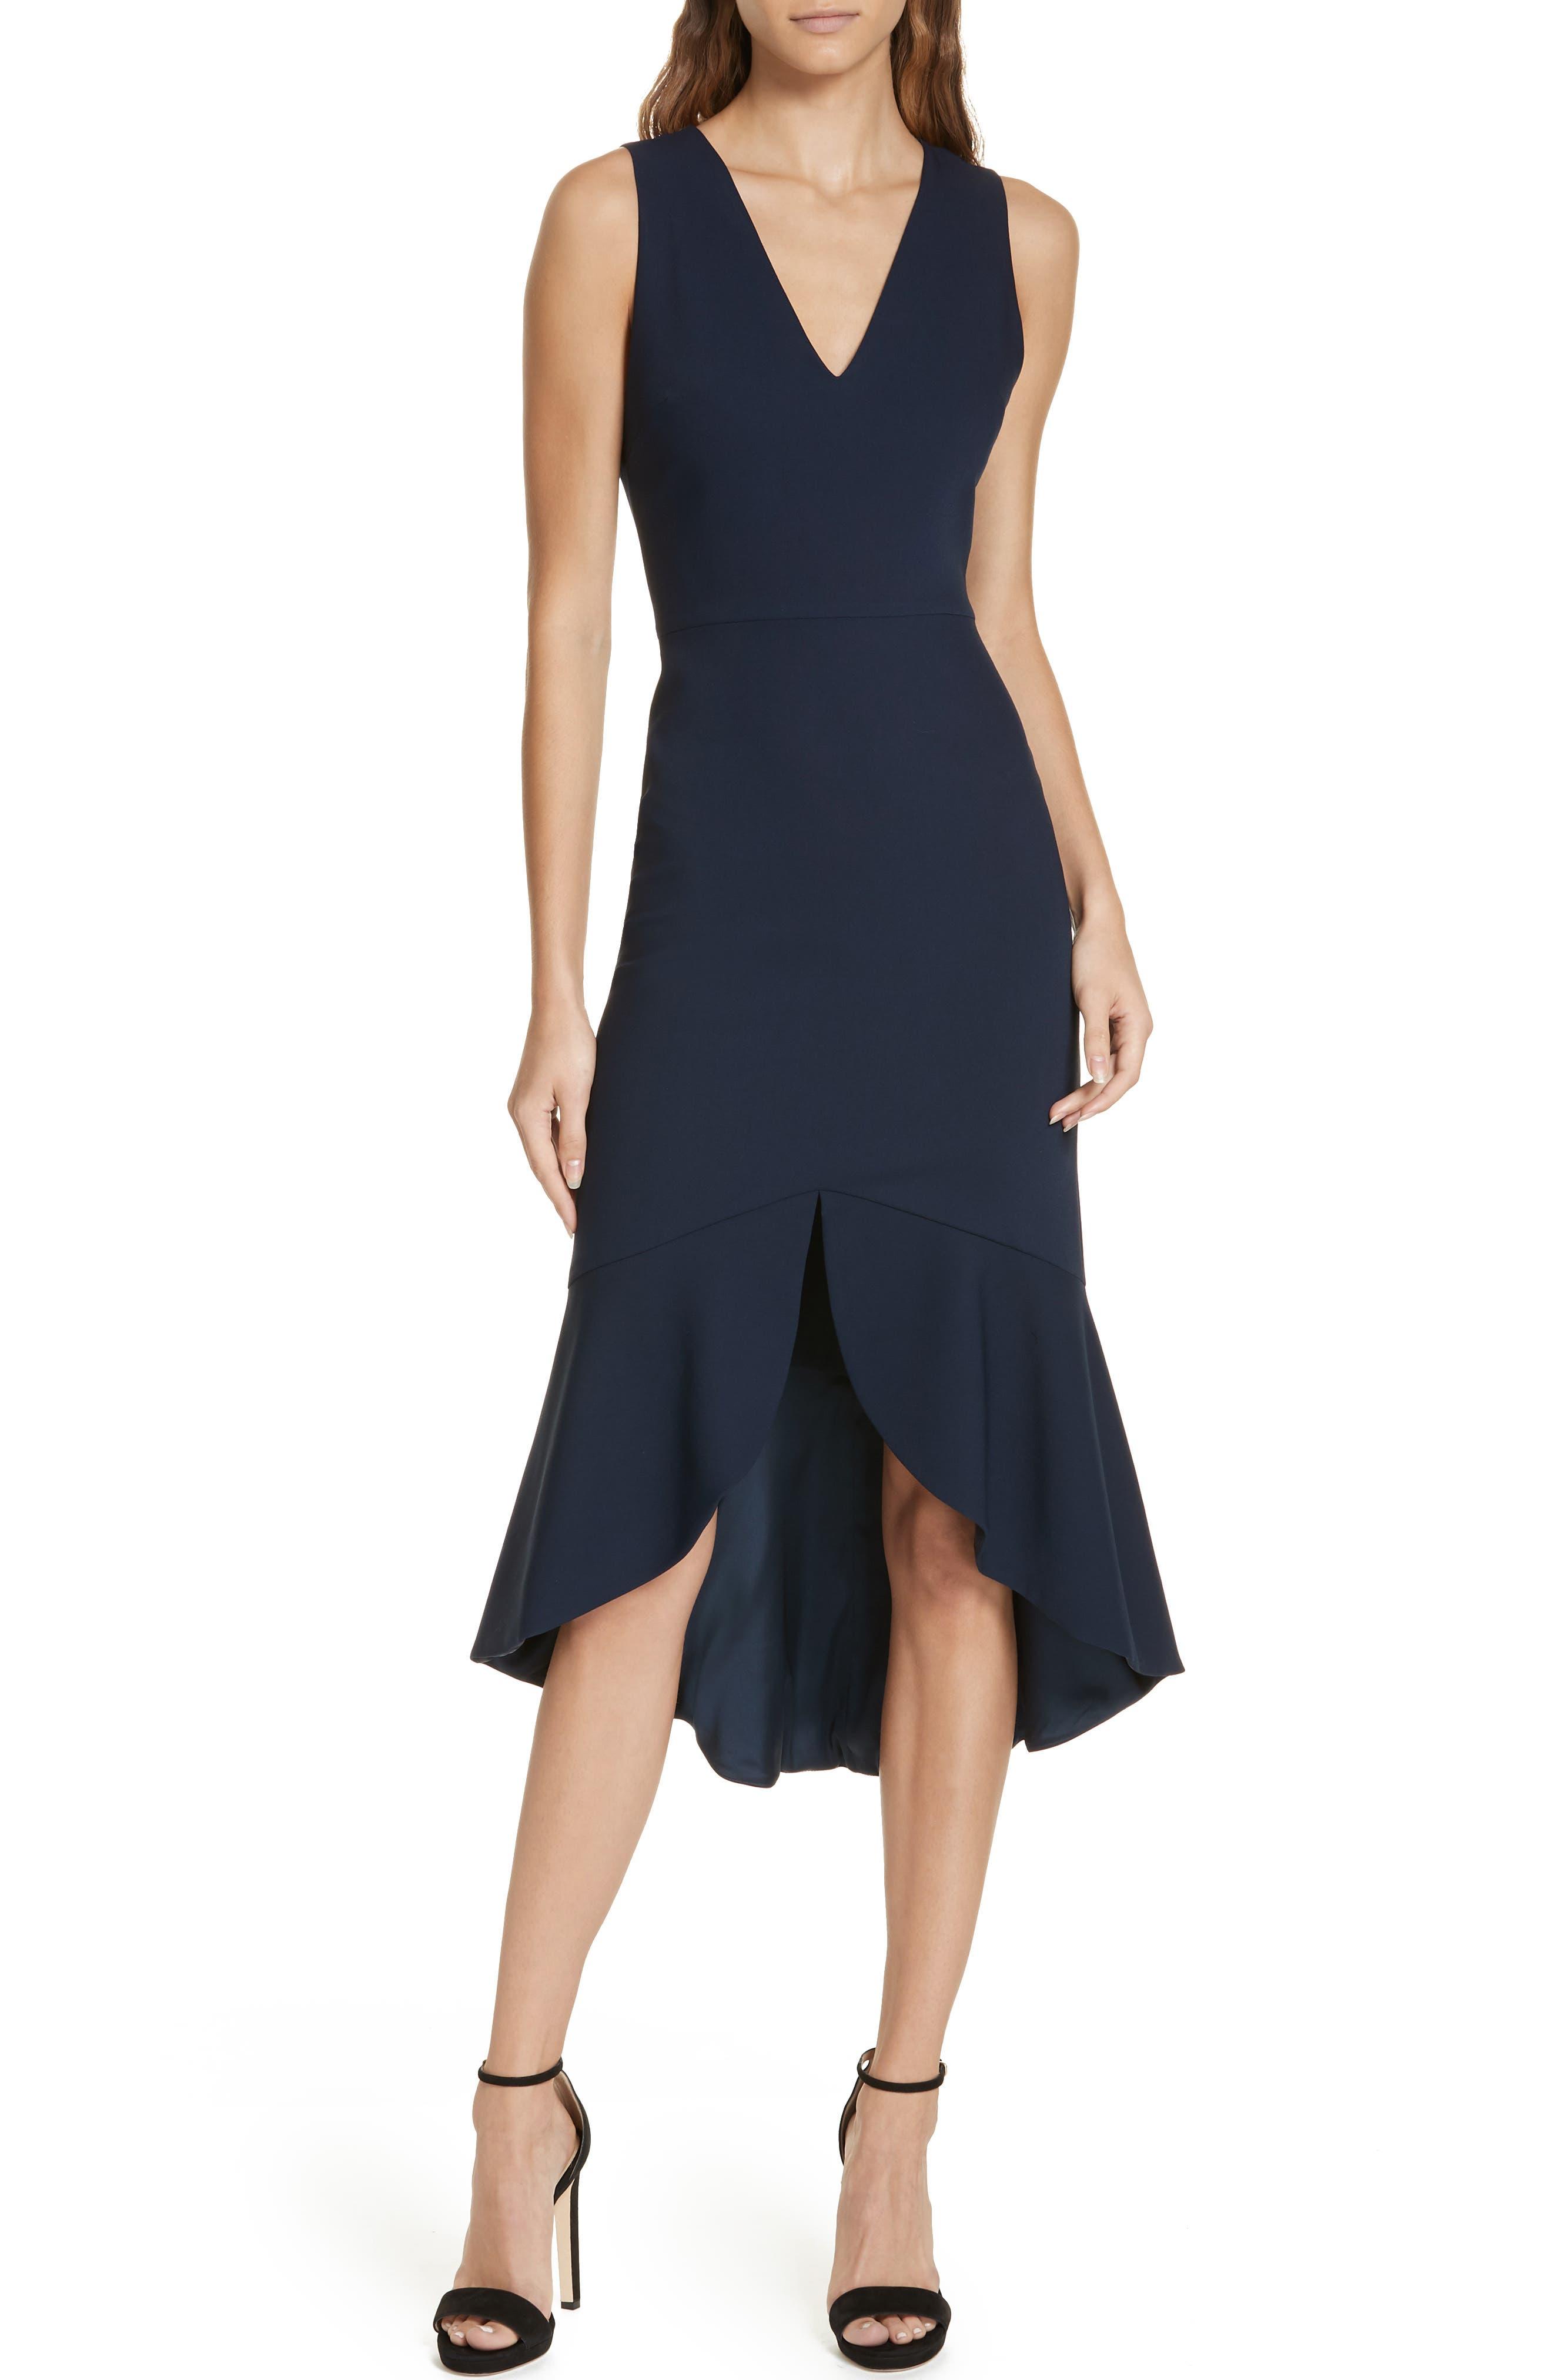 Alice + Olivia Blakesley Split Front Fit & Flare Dress